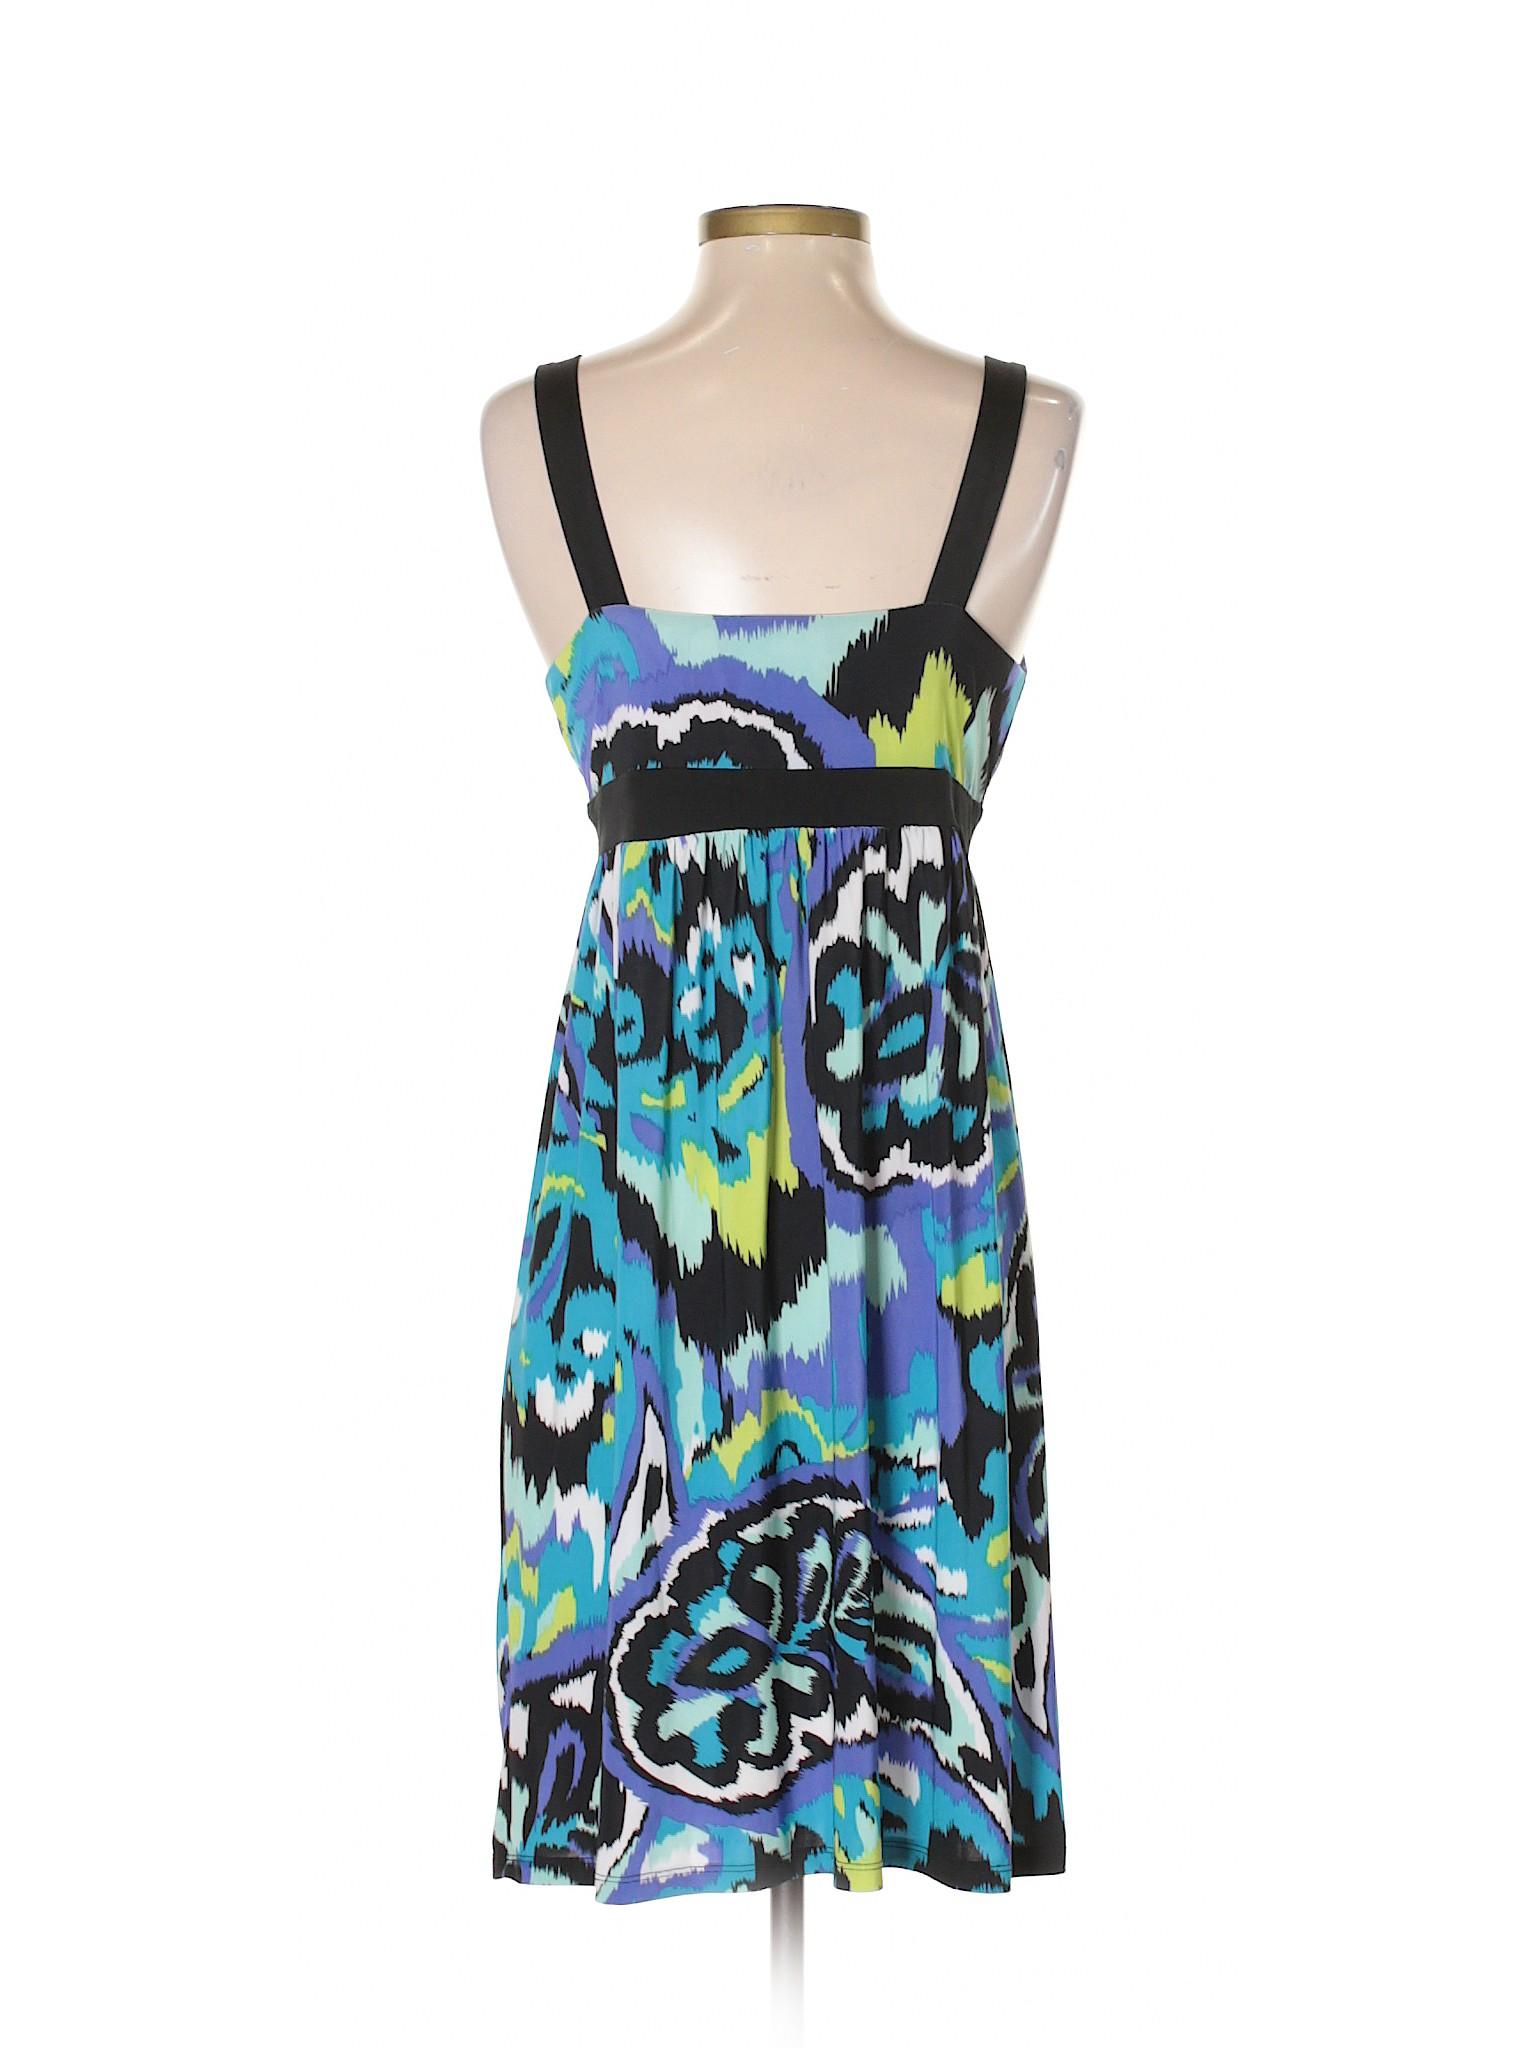 Casual Concepts Selling Dress International INC A1nwqvaSp